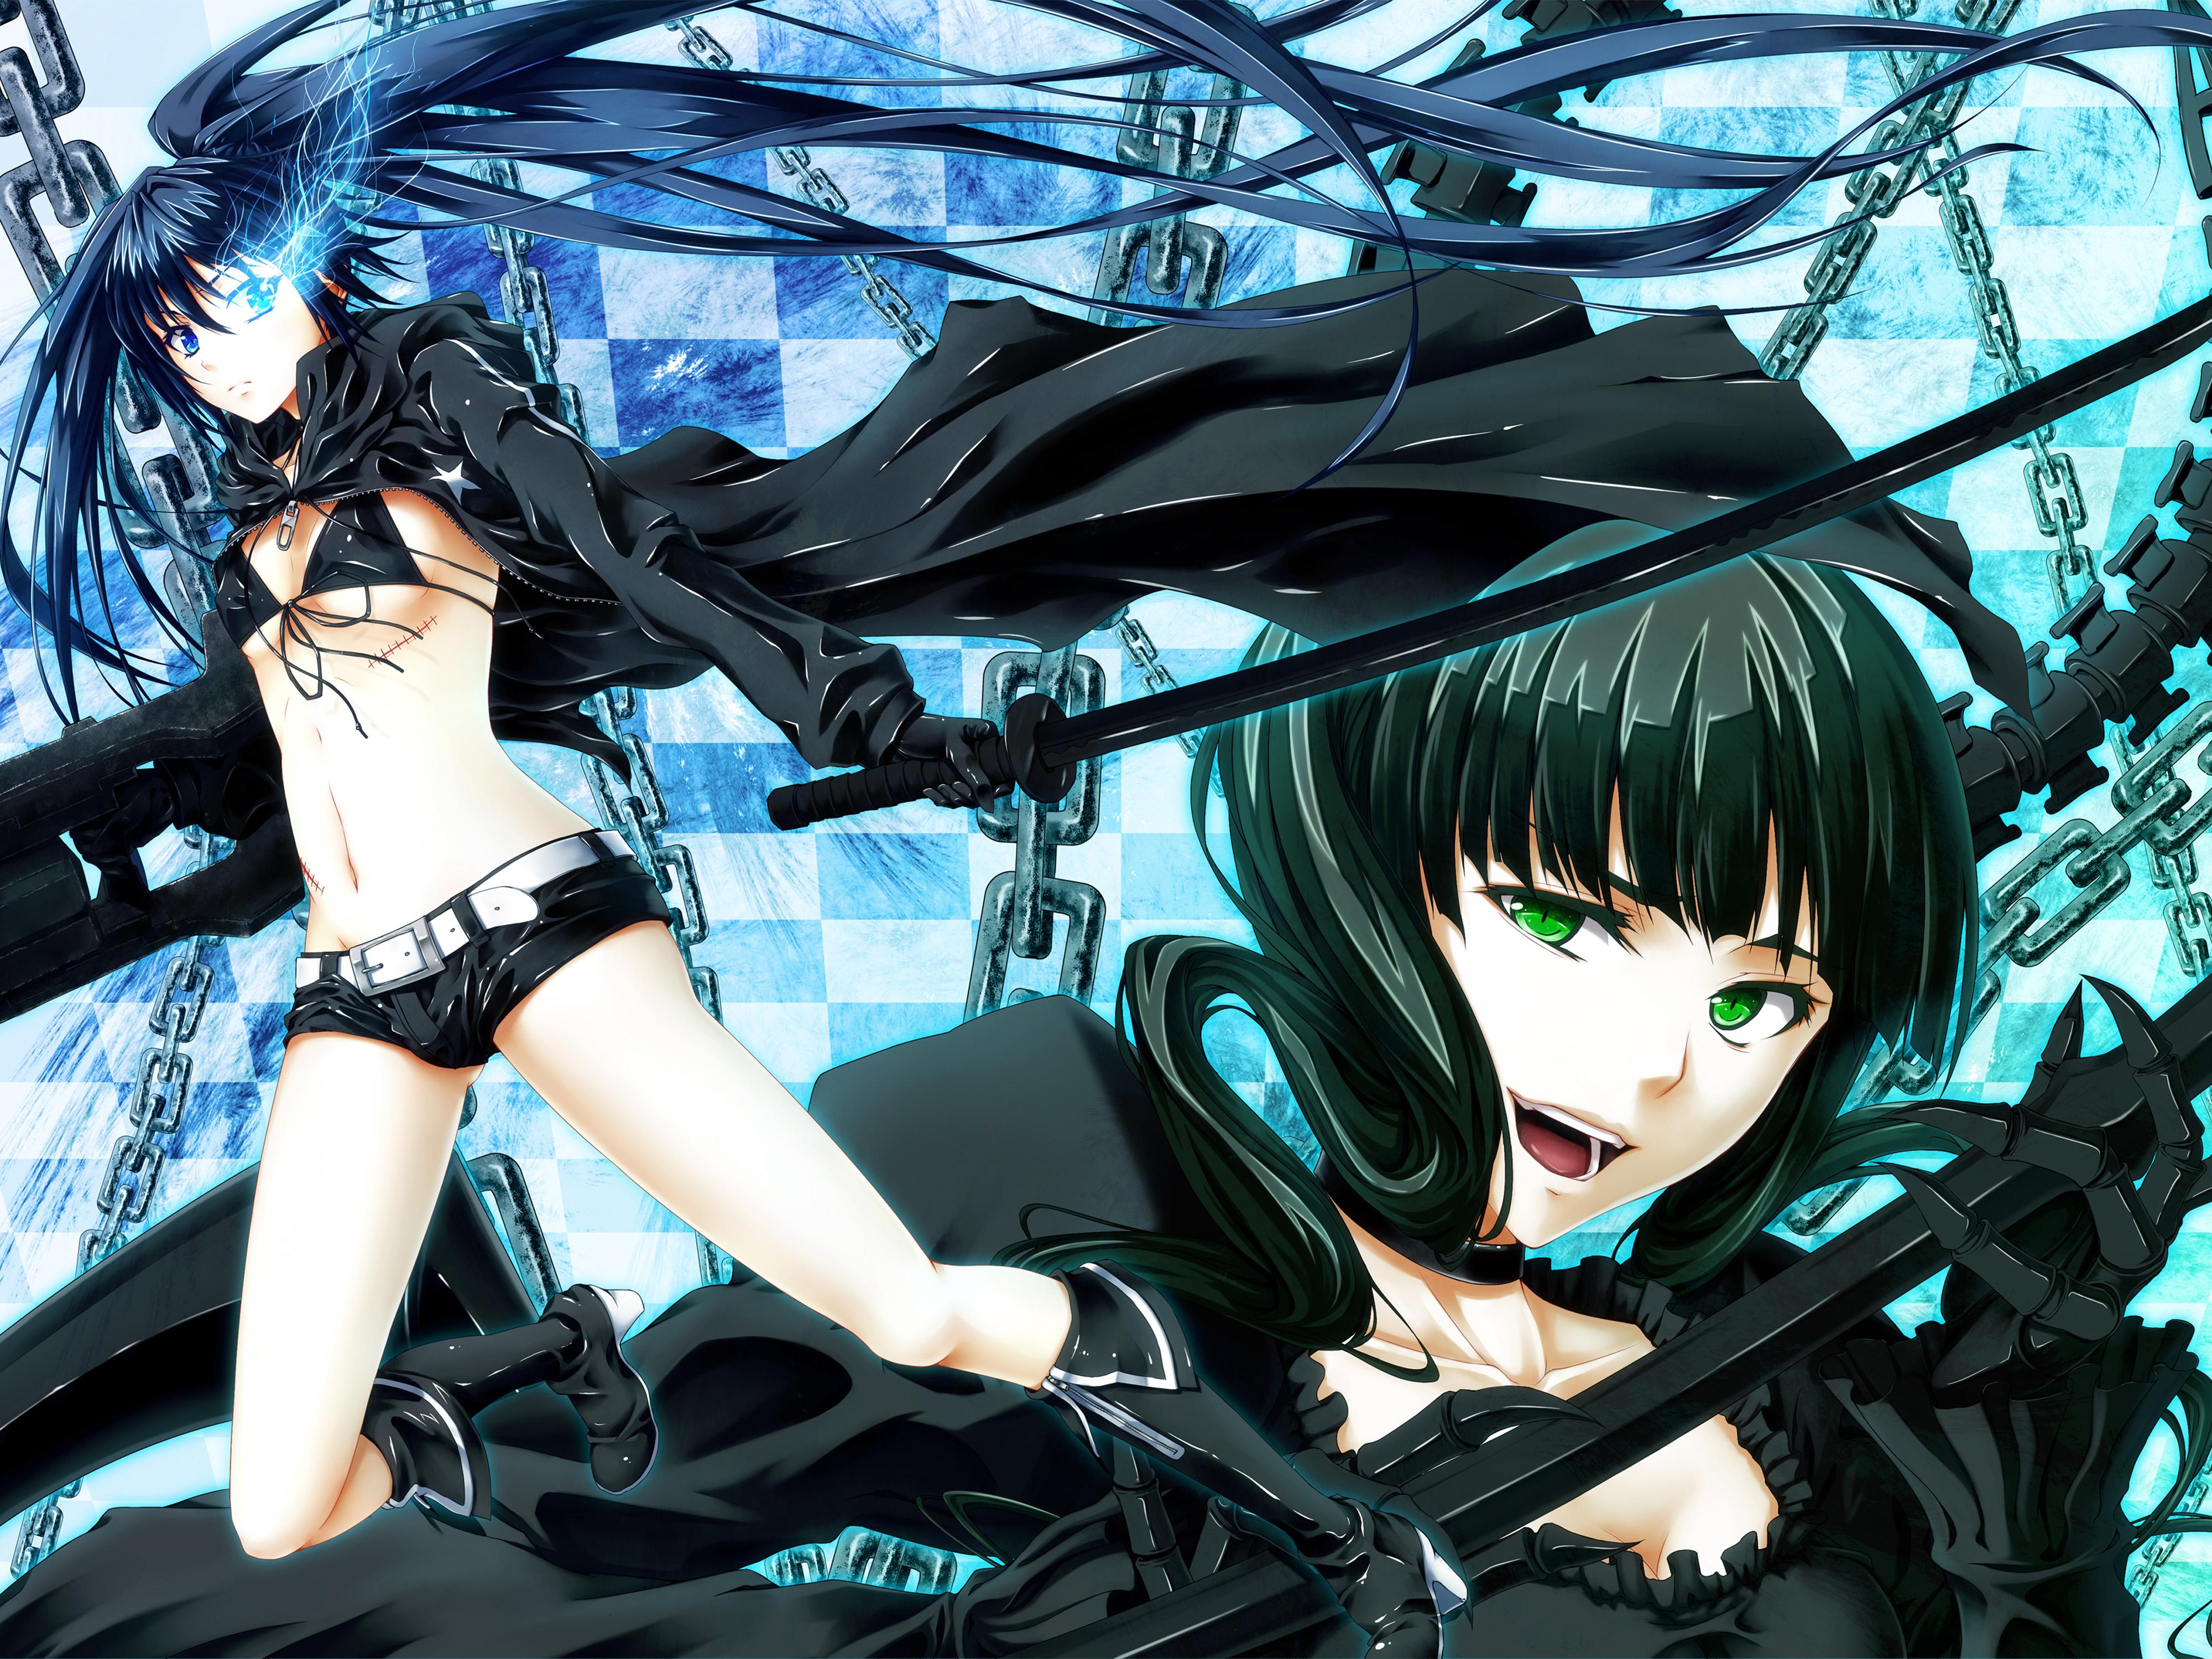 shooter brs rock anime wallpapers dead master fanpop backgrounds 4k background alphacoders desktop computer abyss